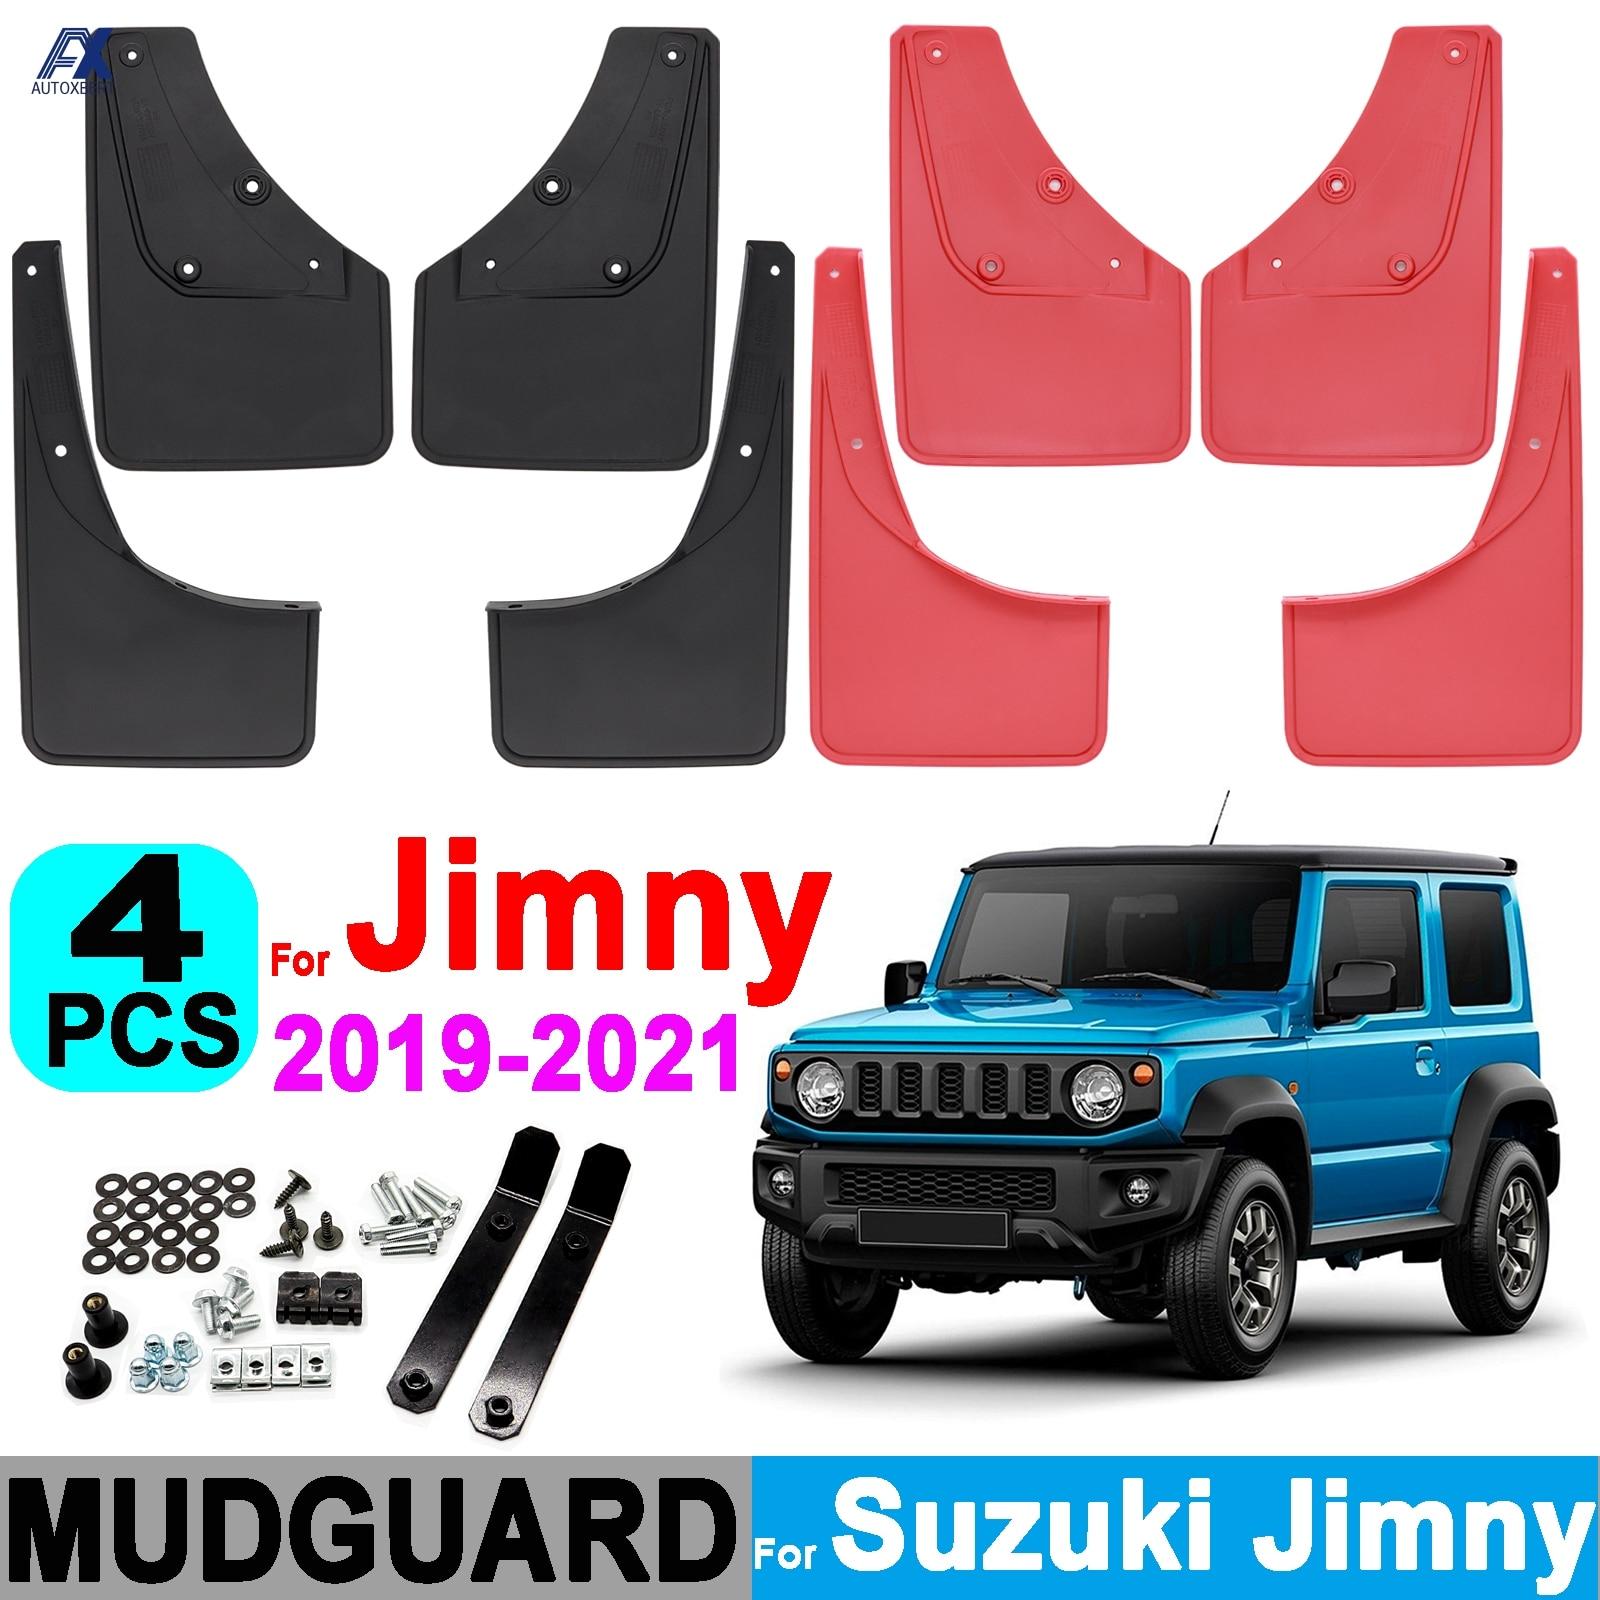 4X واقيات الطين للسيارات واقيات الطين لسوزوكي جيمي سييرا JB64 JB74 2019 2020 2021 واقيات الطين واقيات الطين تصميم السيارة الأمامي والخلفي